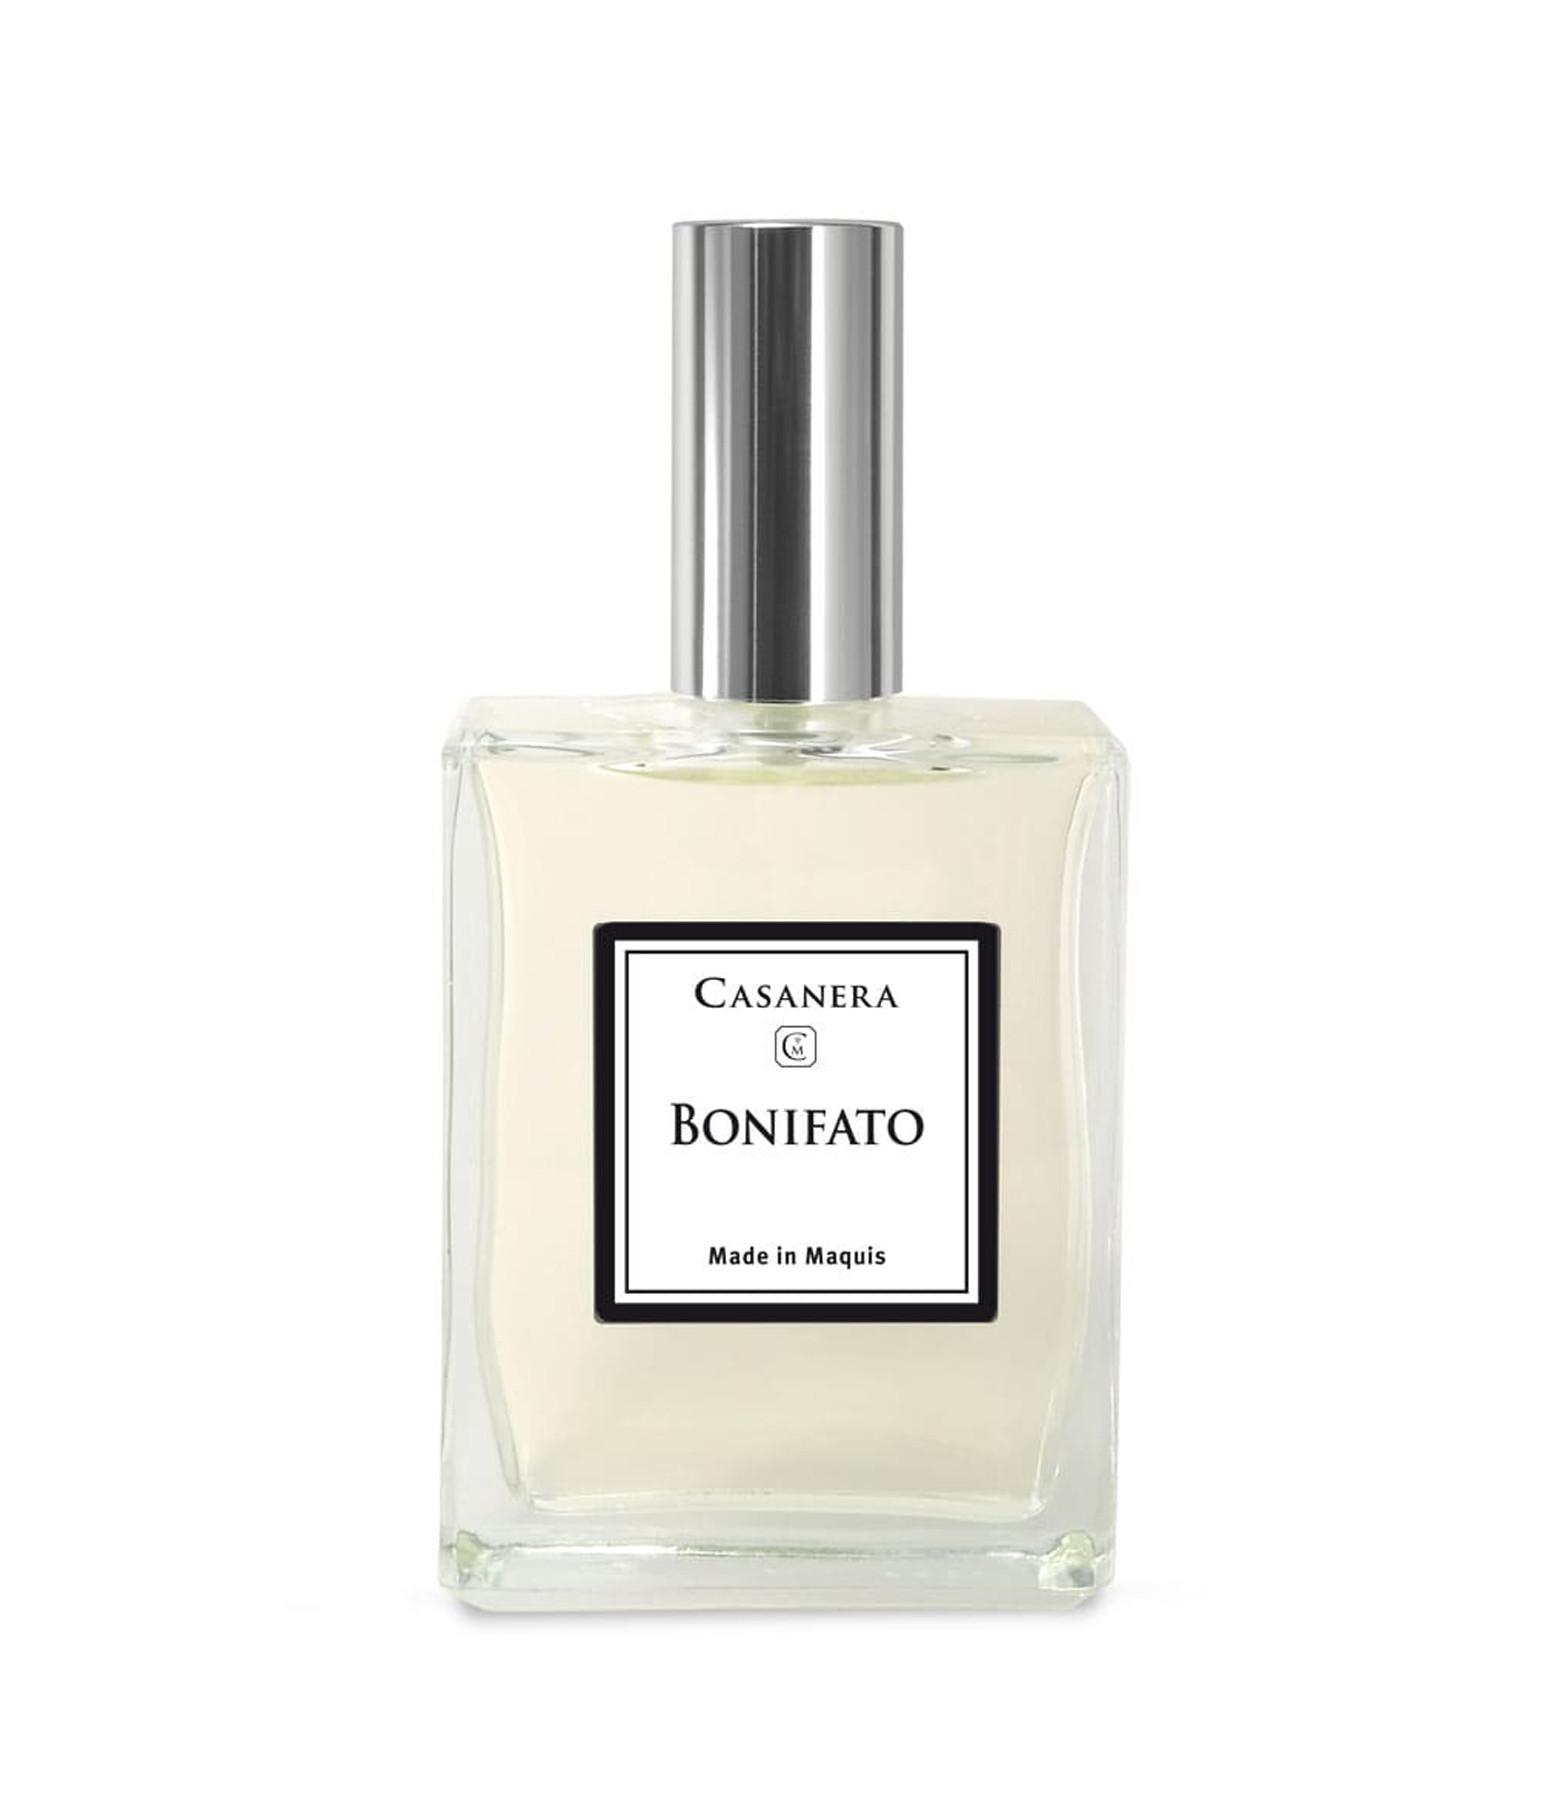 CASANERA - Eau de Parfum Bonifato 100ml